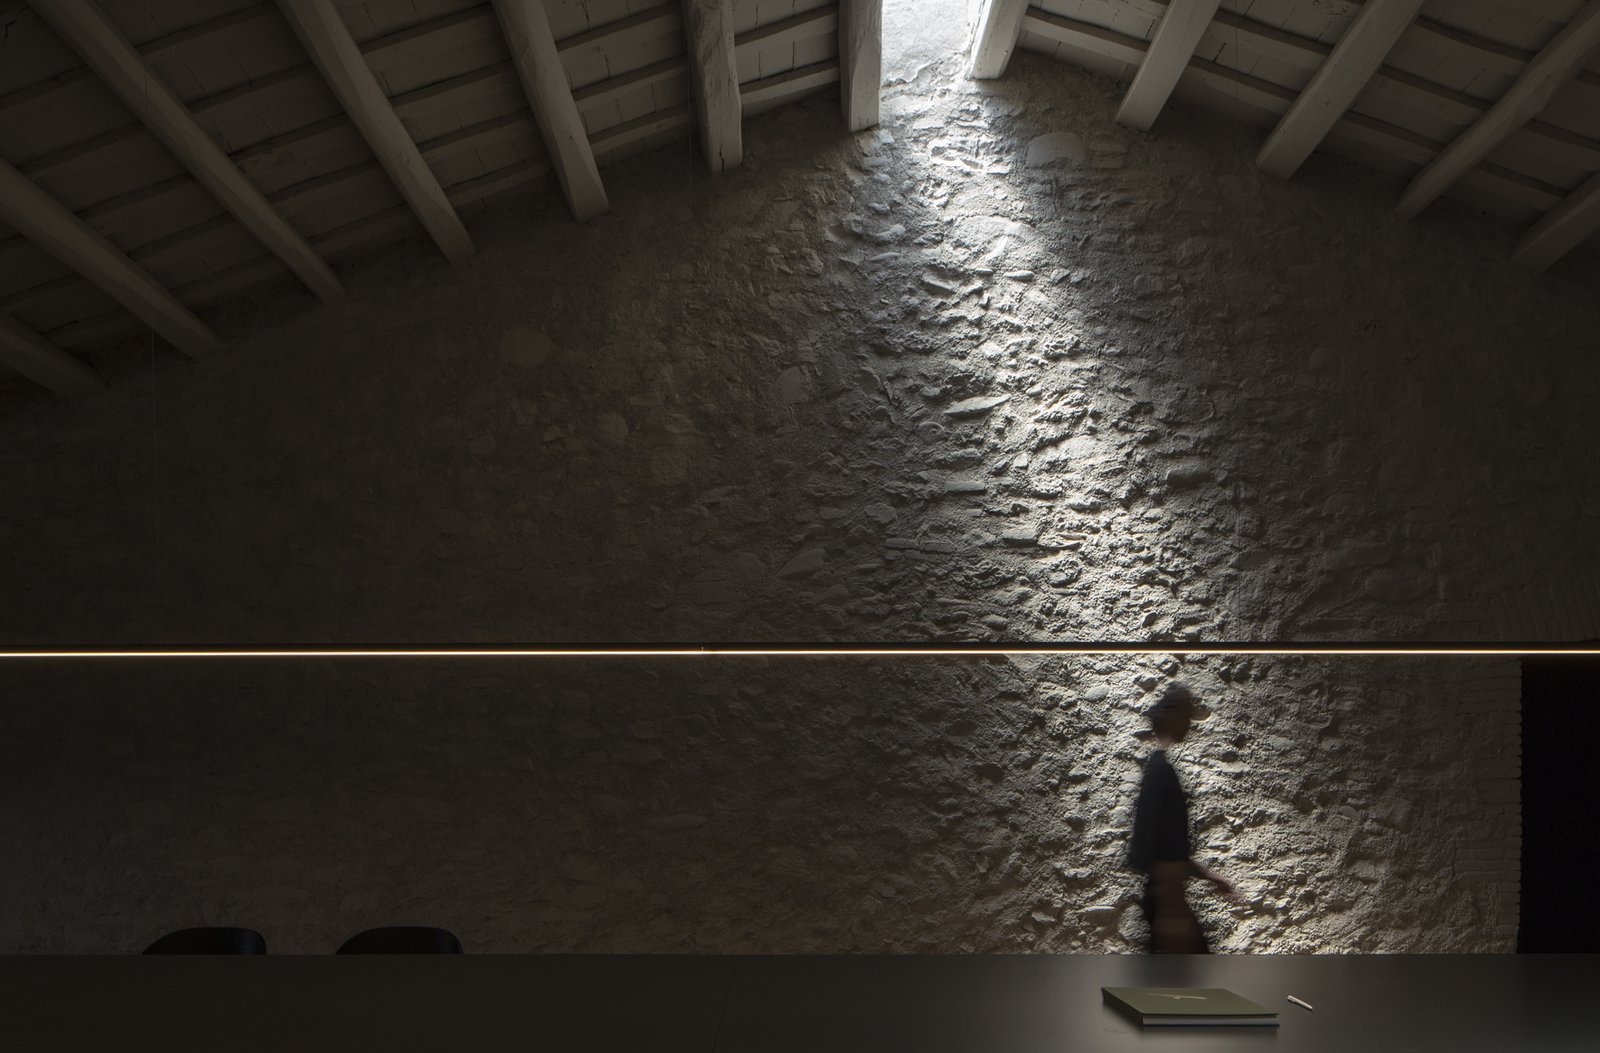 Office, Study Room Type, Desk, and Lamps  Sant Martí House by Francesc Rifé Studio